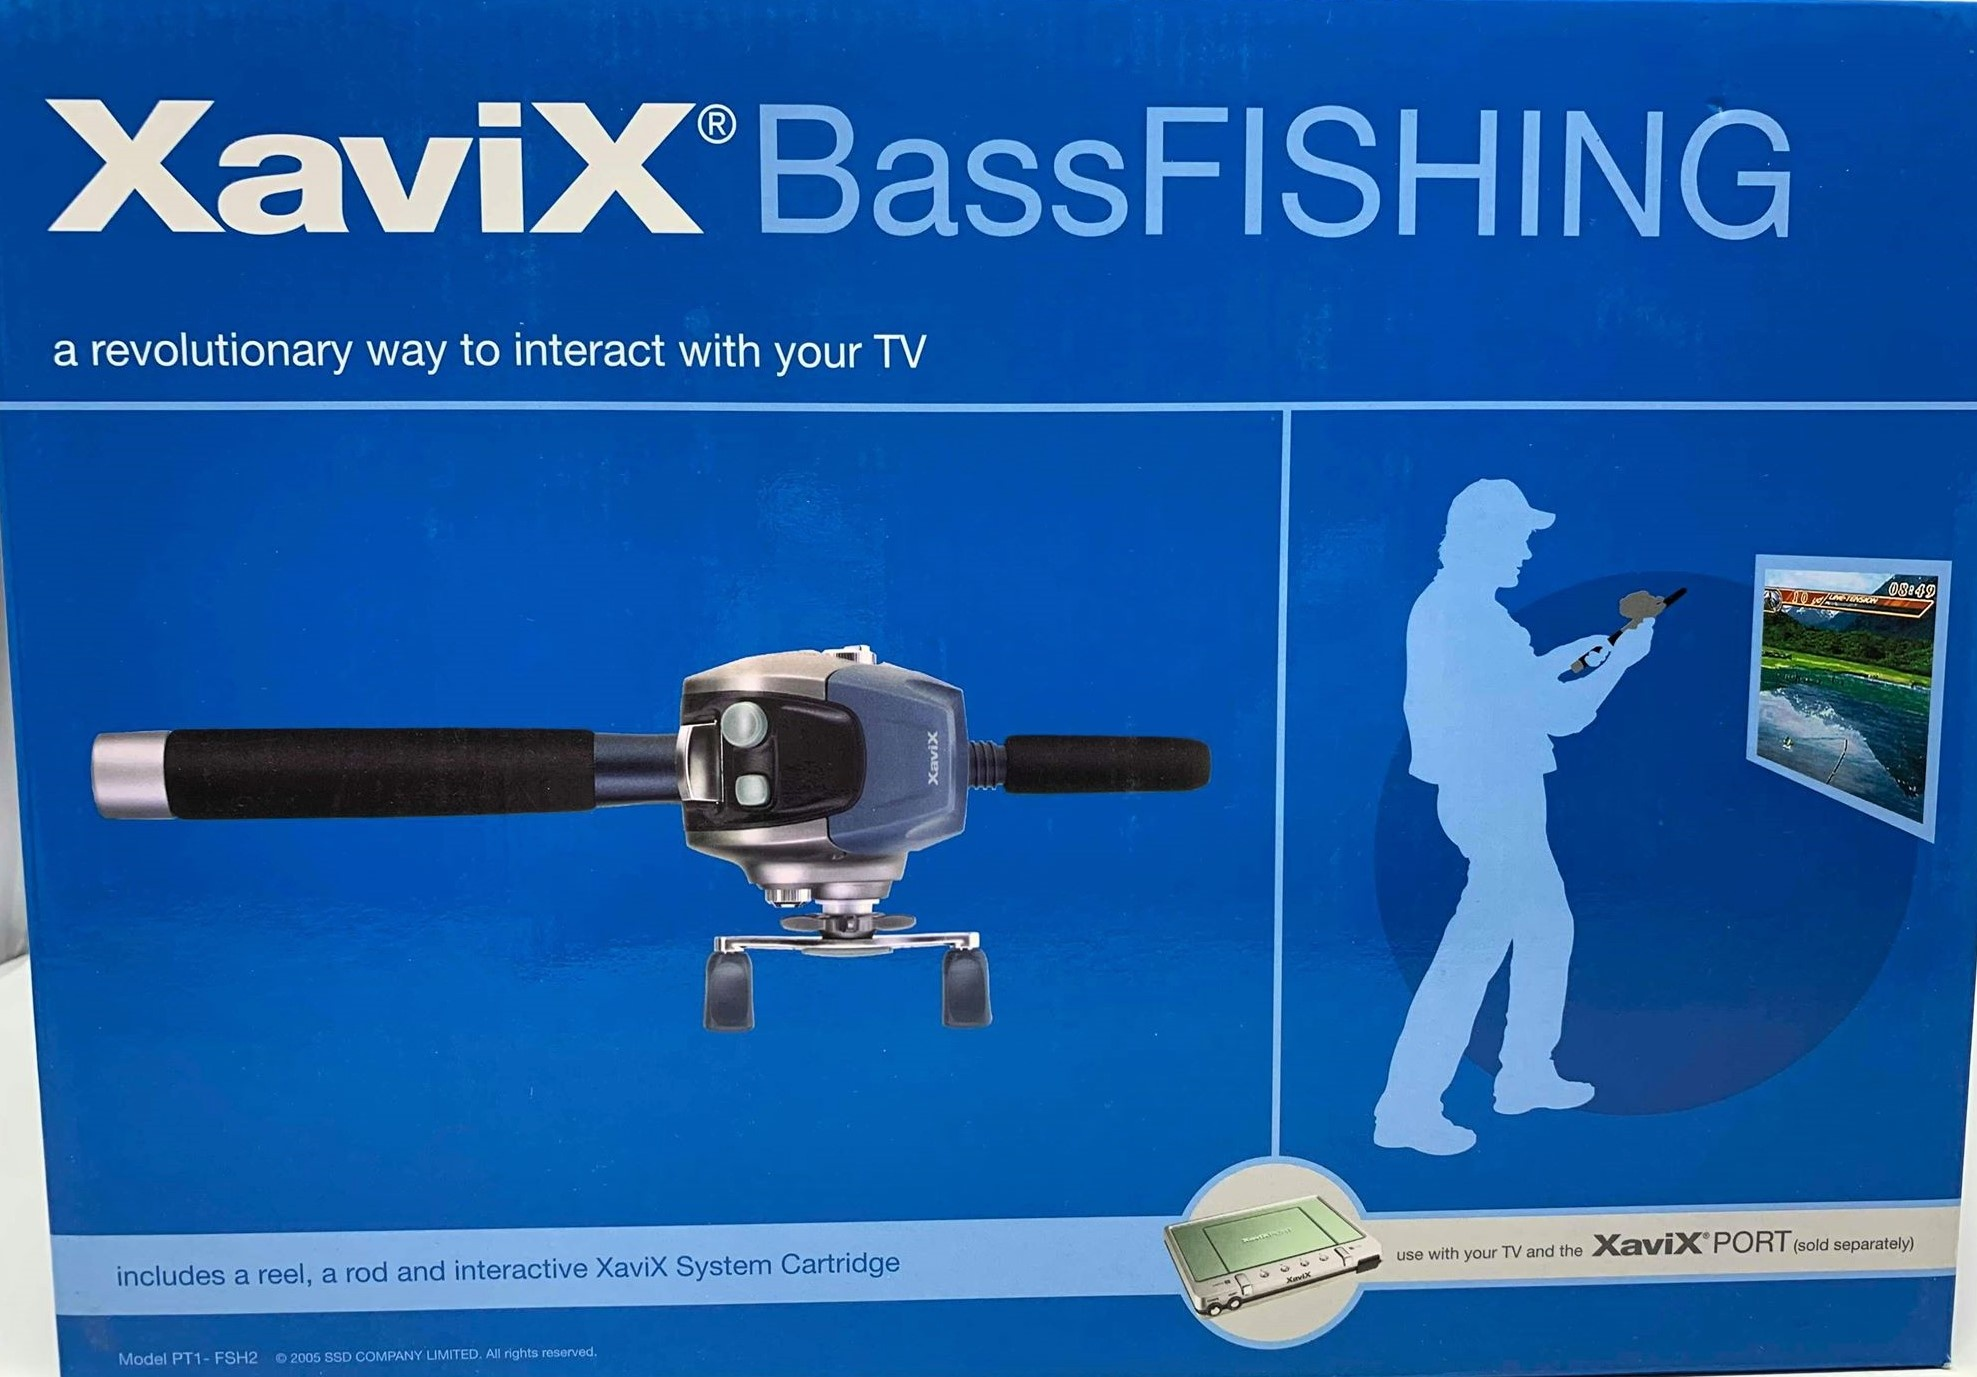 XaviX Bass Fishing Expansion